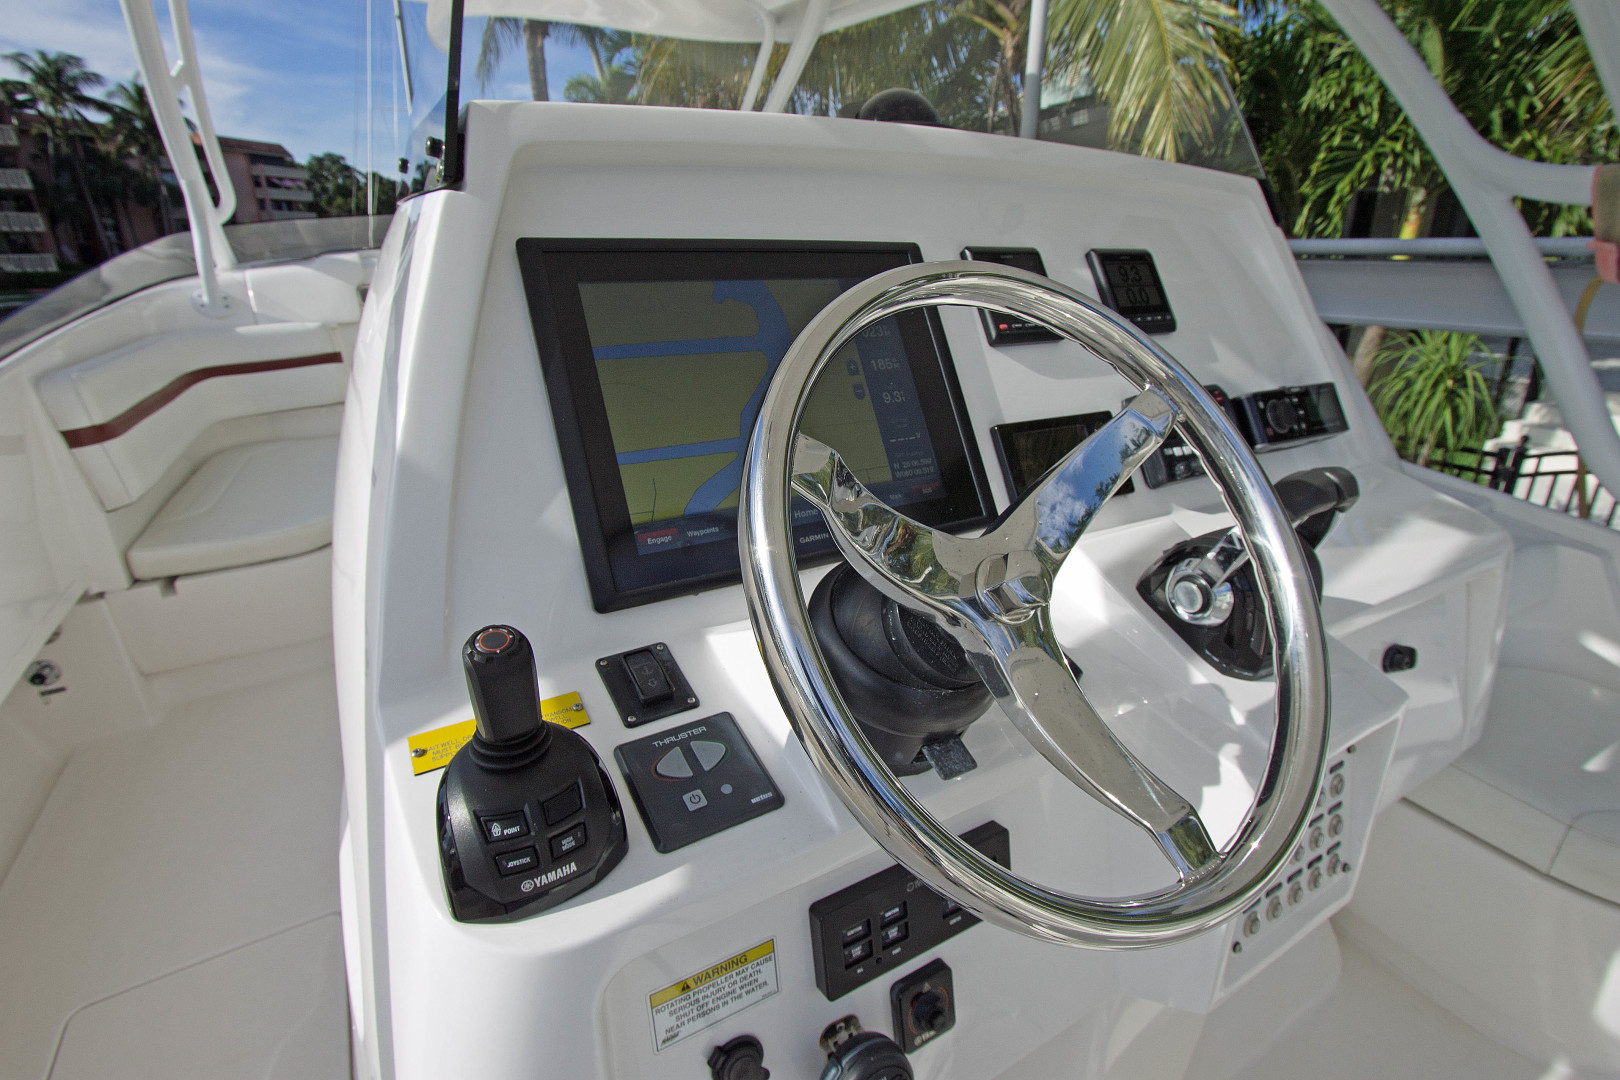 Intrepid-375 Walkaround 2014-NN 375 Walkaround 2014 Fort Lauderdale-Florida-United States-1507854 | Thumbnail